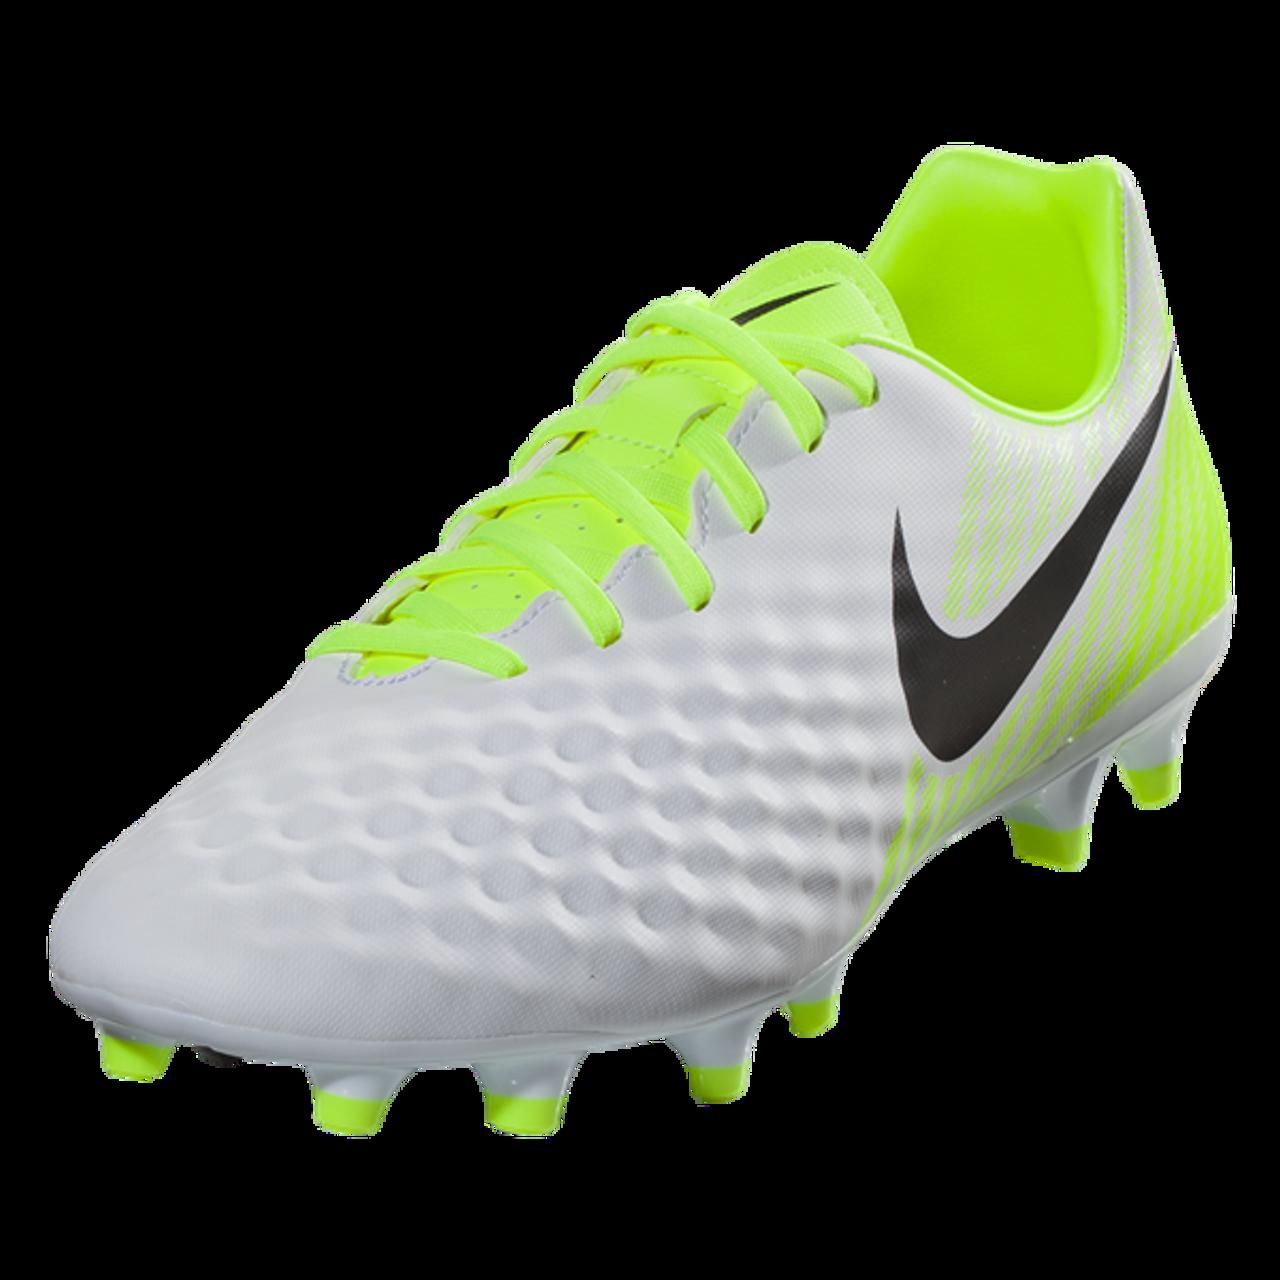 55dac7c54311 Nike Magista Onda II FG - White Black Volt Pure Platinum SD (111617) - ohp  soccer